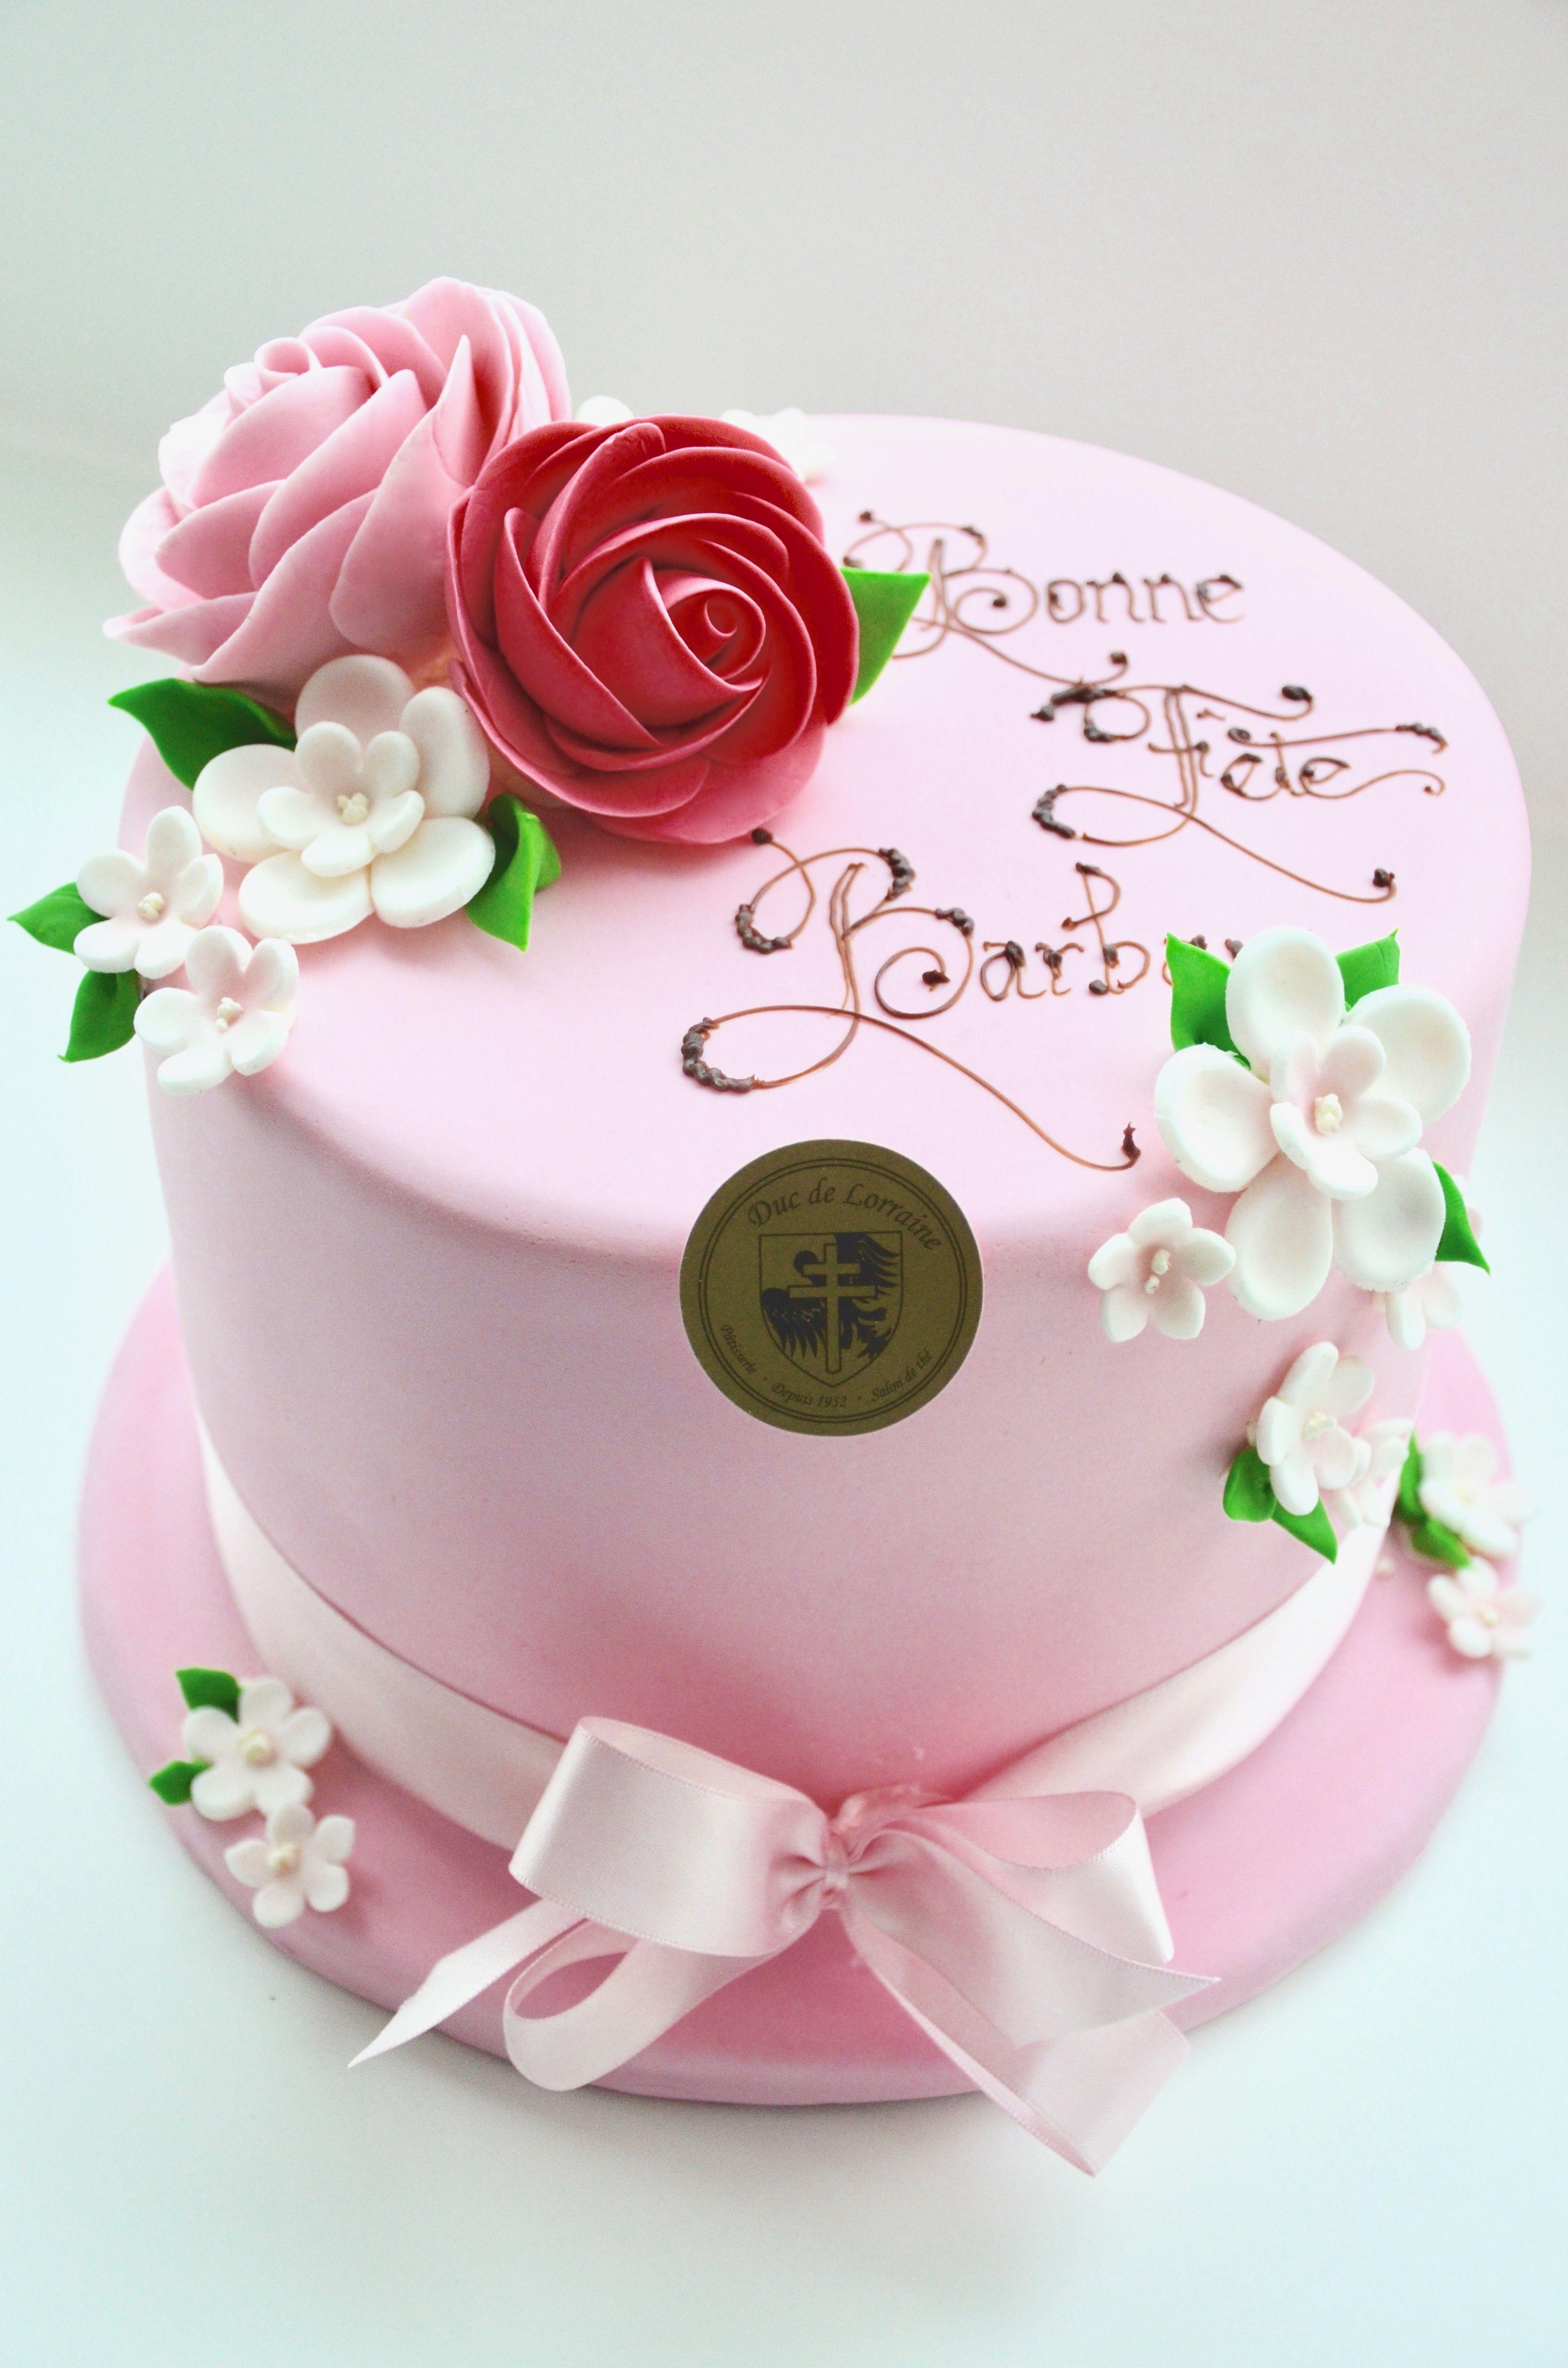 Stupendous Special Orders In 2020 Themed Birthday Cakes Custom Birthday Funny Birthday Cards Online Benoljebrpdamsfinfo